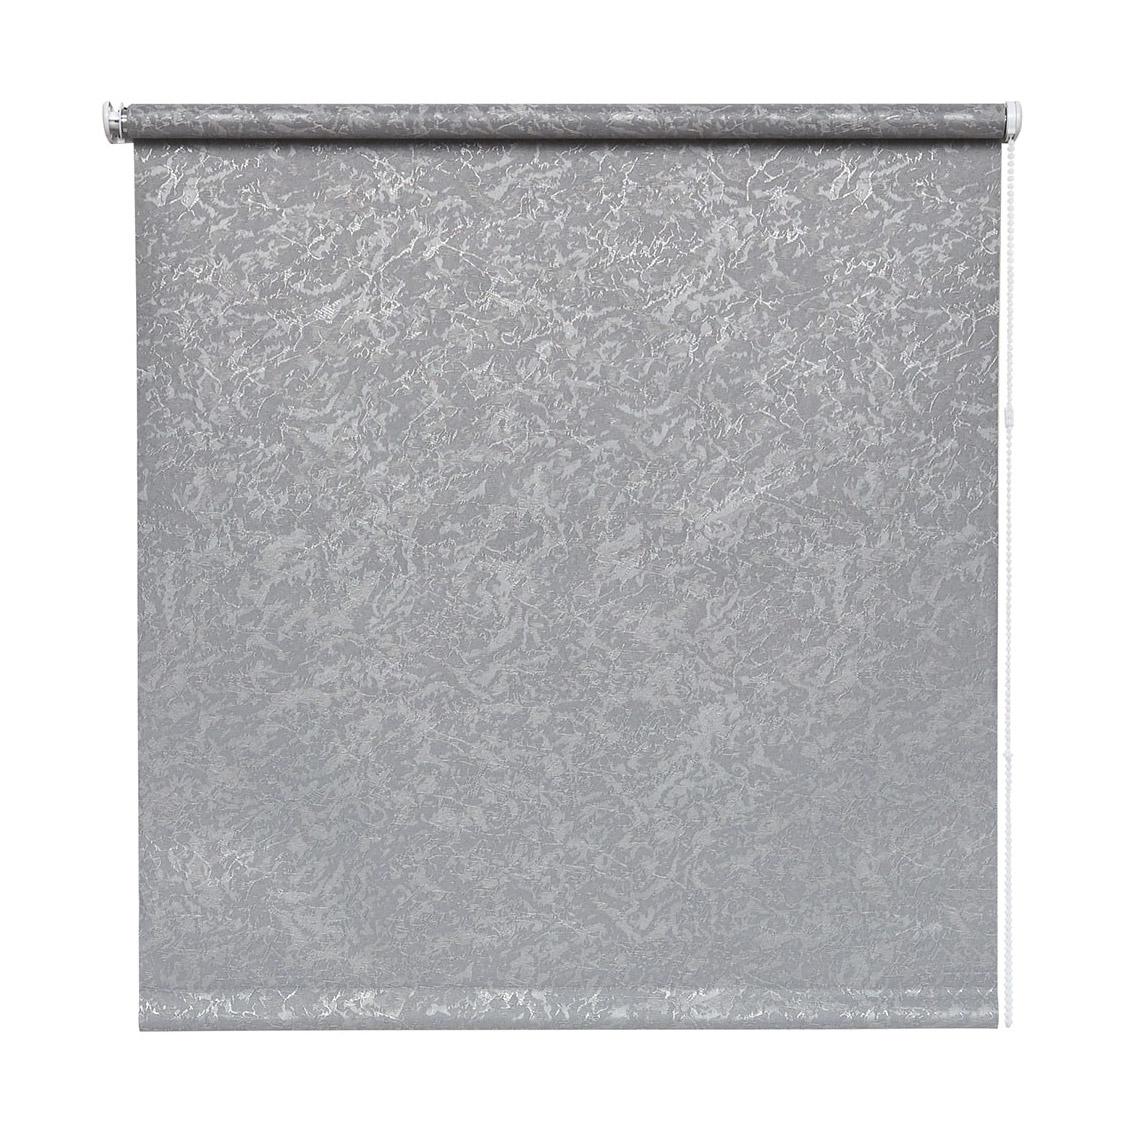 Фото - Штора рулонная Уют Фрост 40х175 см серый штора рулонная уют фрост персиковая 40х175 см